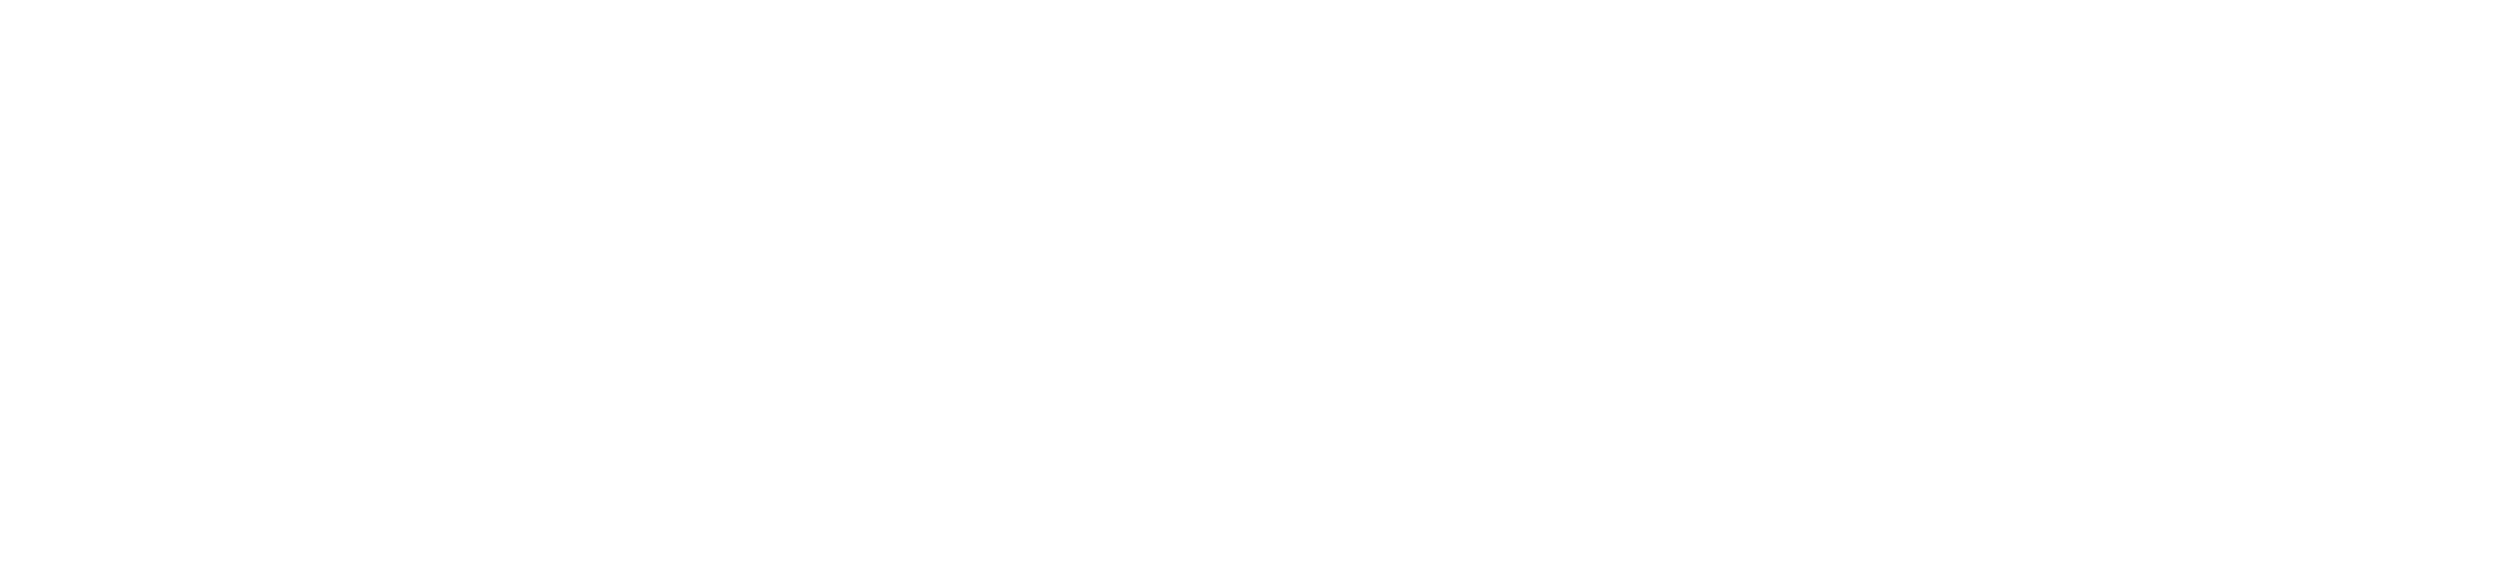 Celebrate Financial Planning logo Celebrate Financial Planning Cincinnati, OH